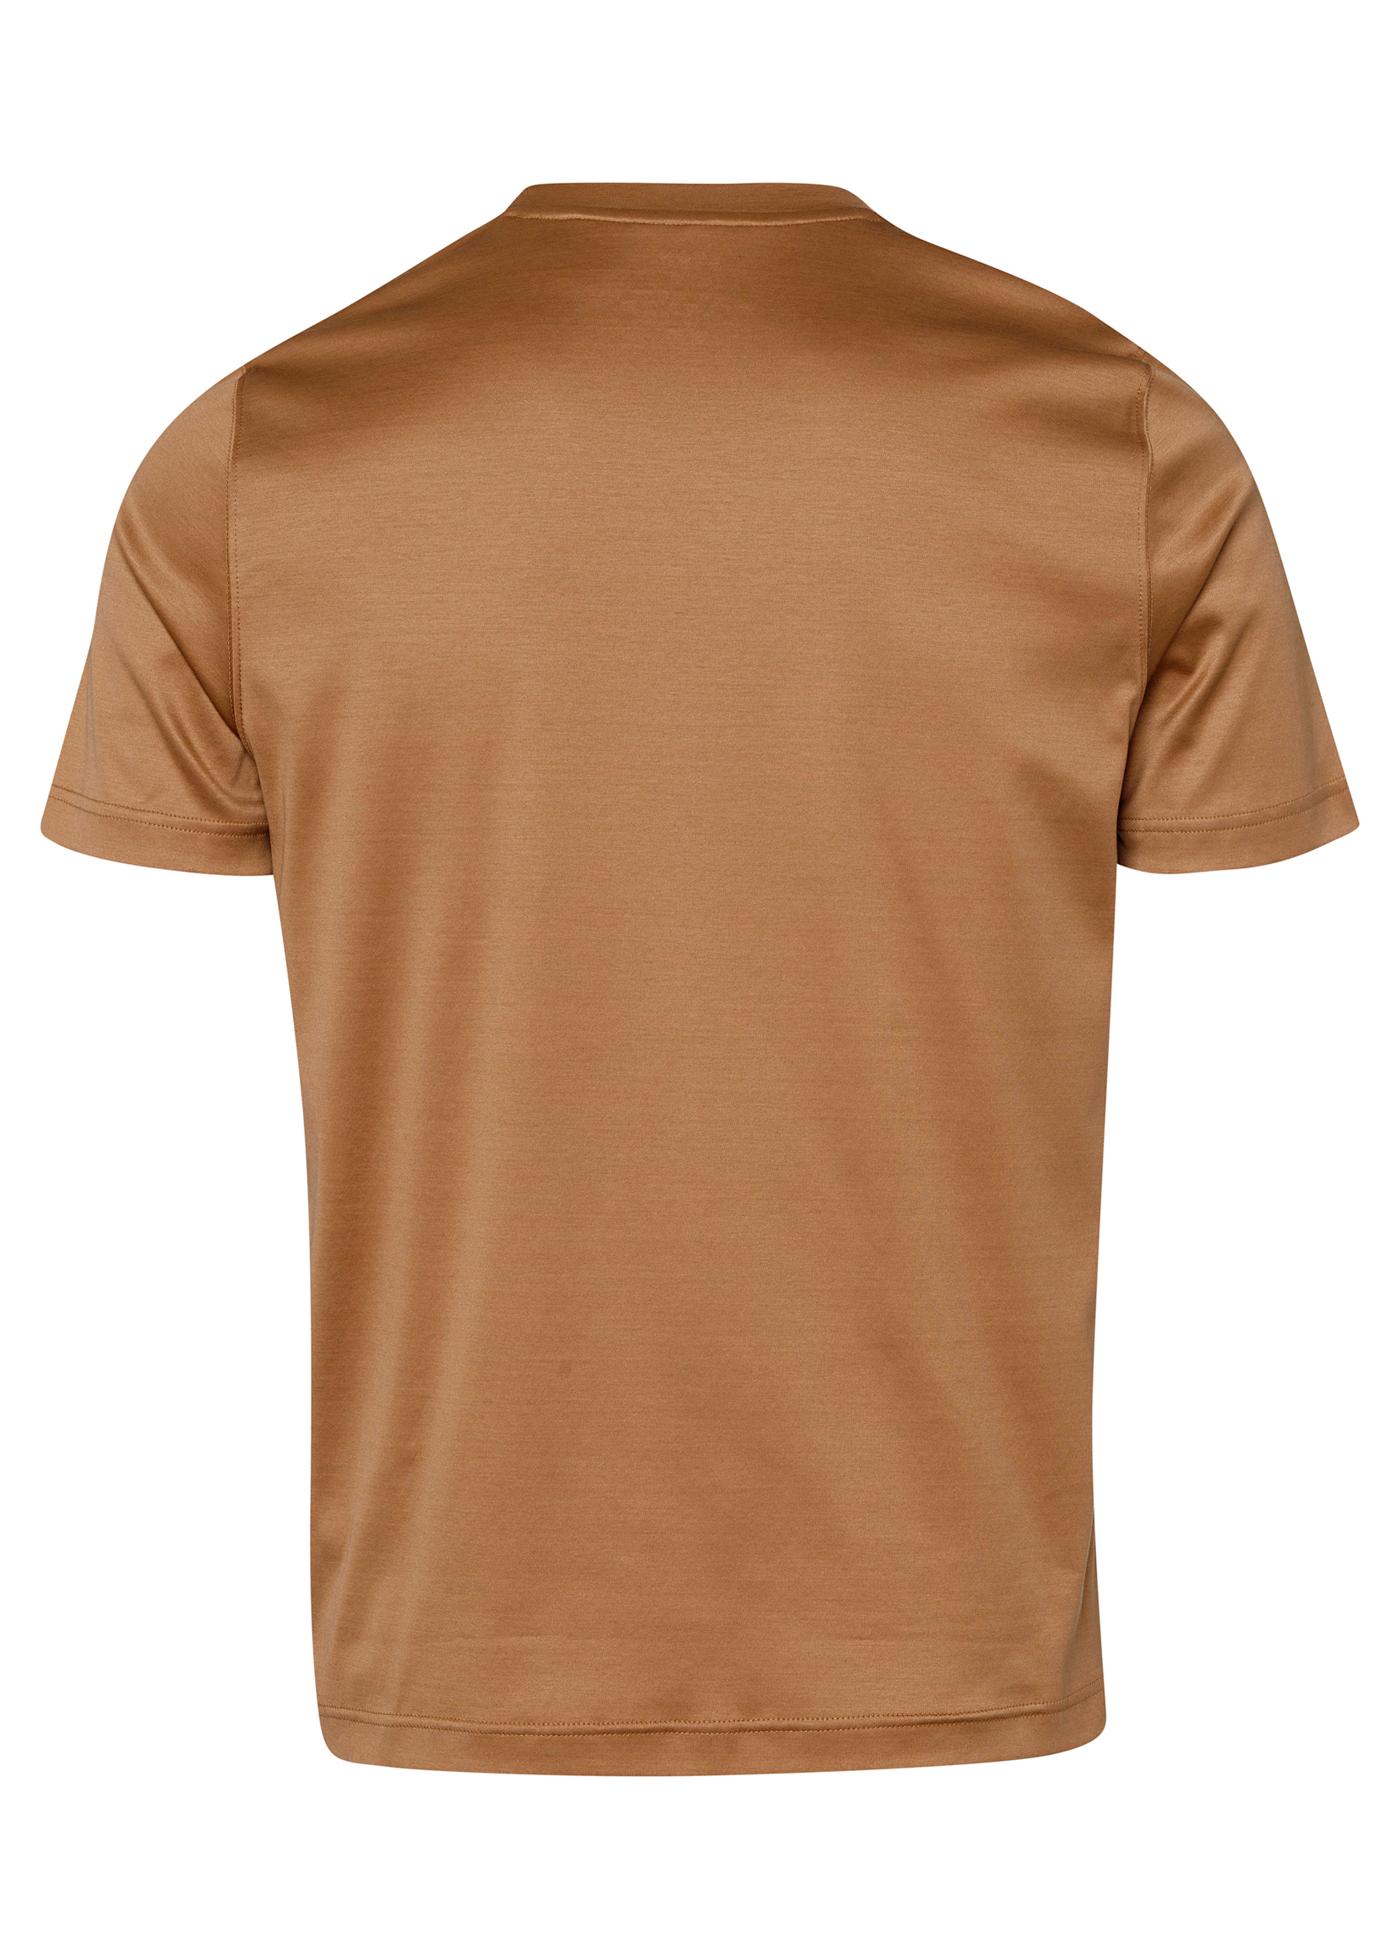 1000023563209 Men shirt: Casual / Jersey image number 1